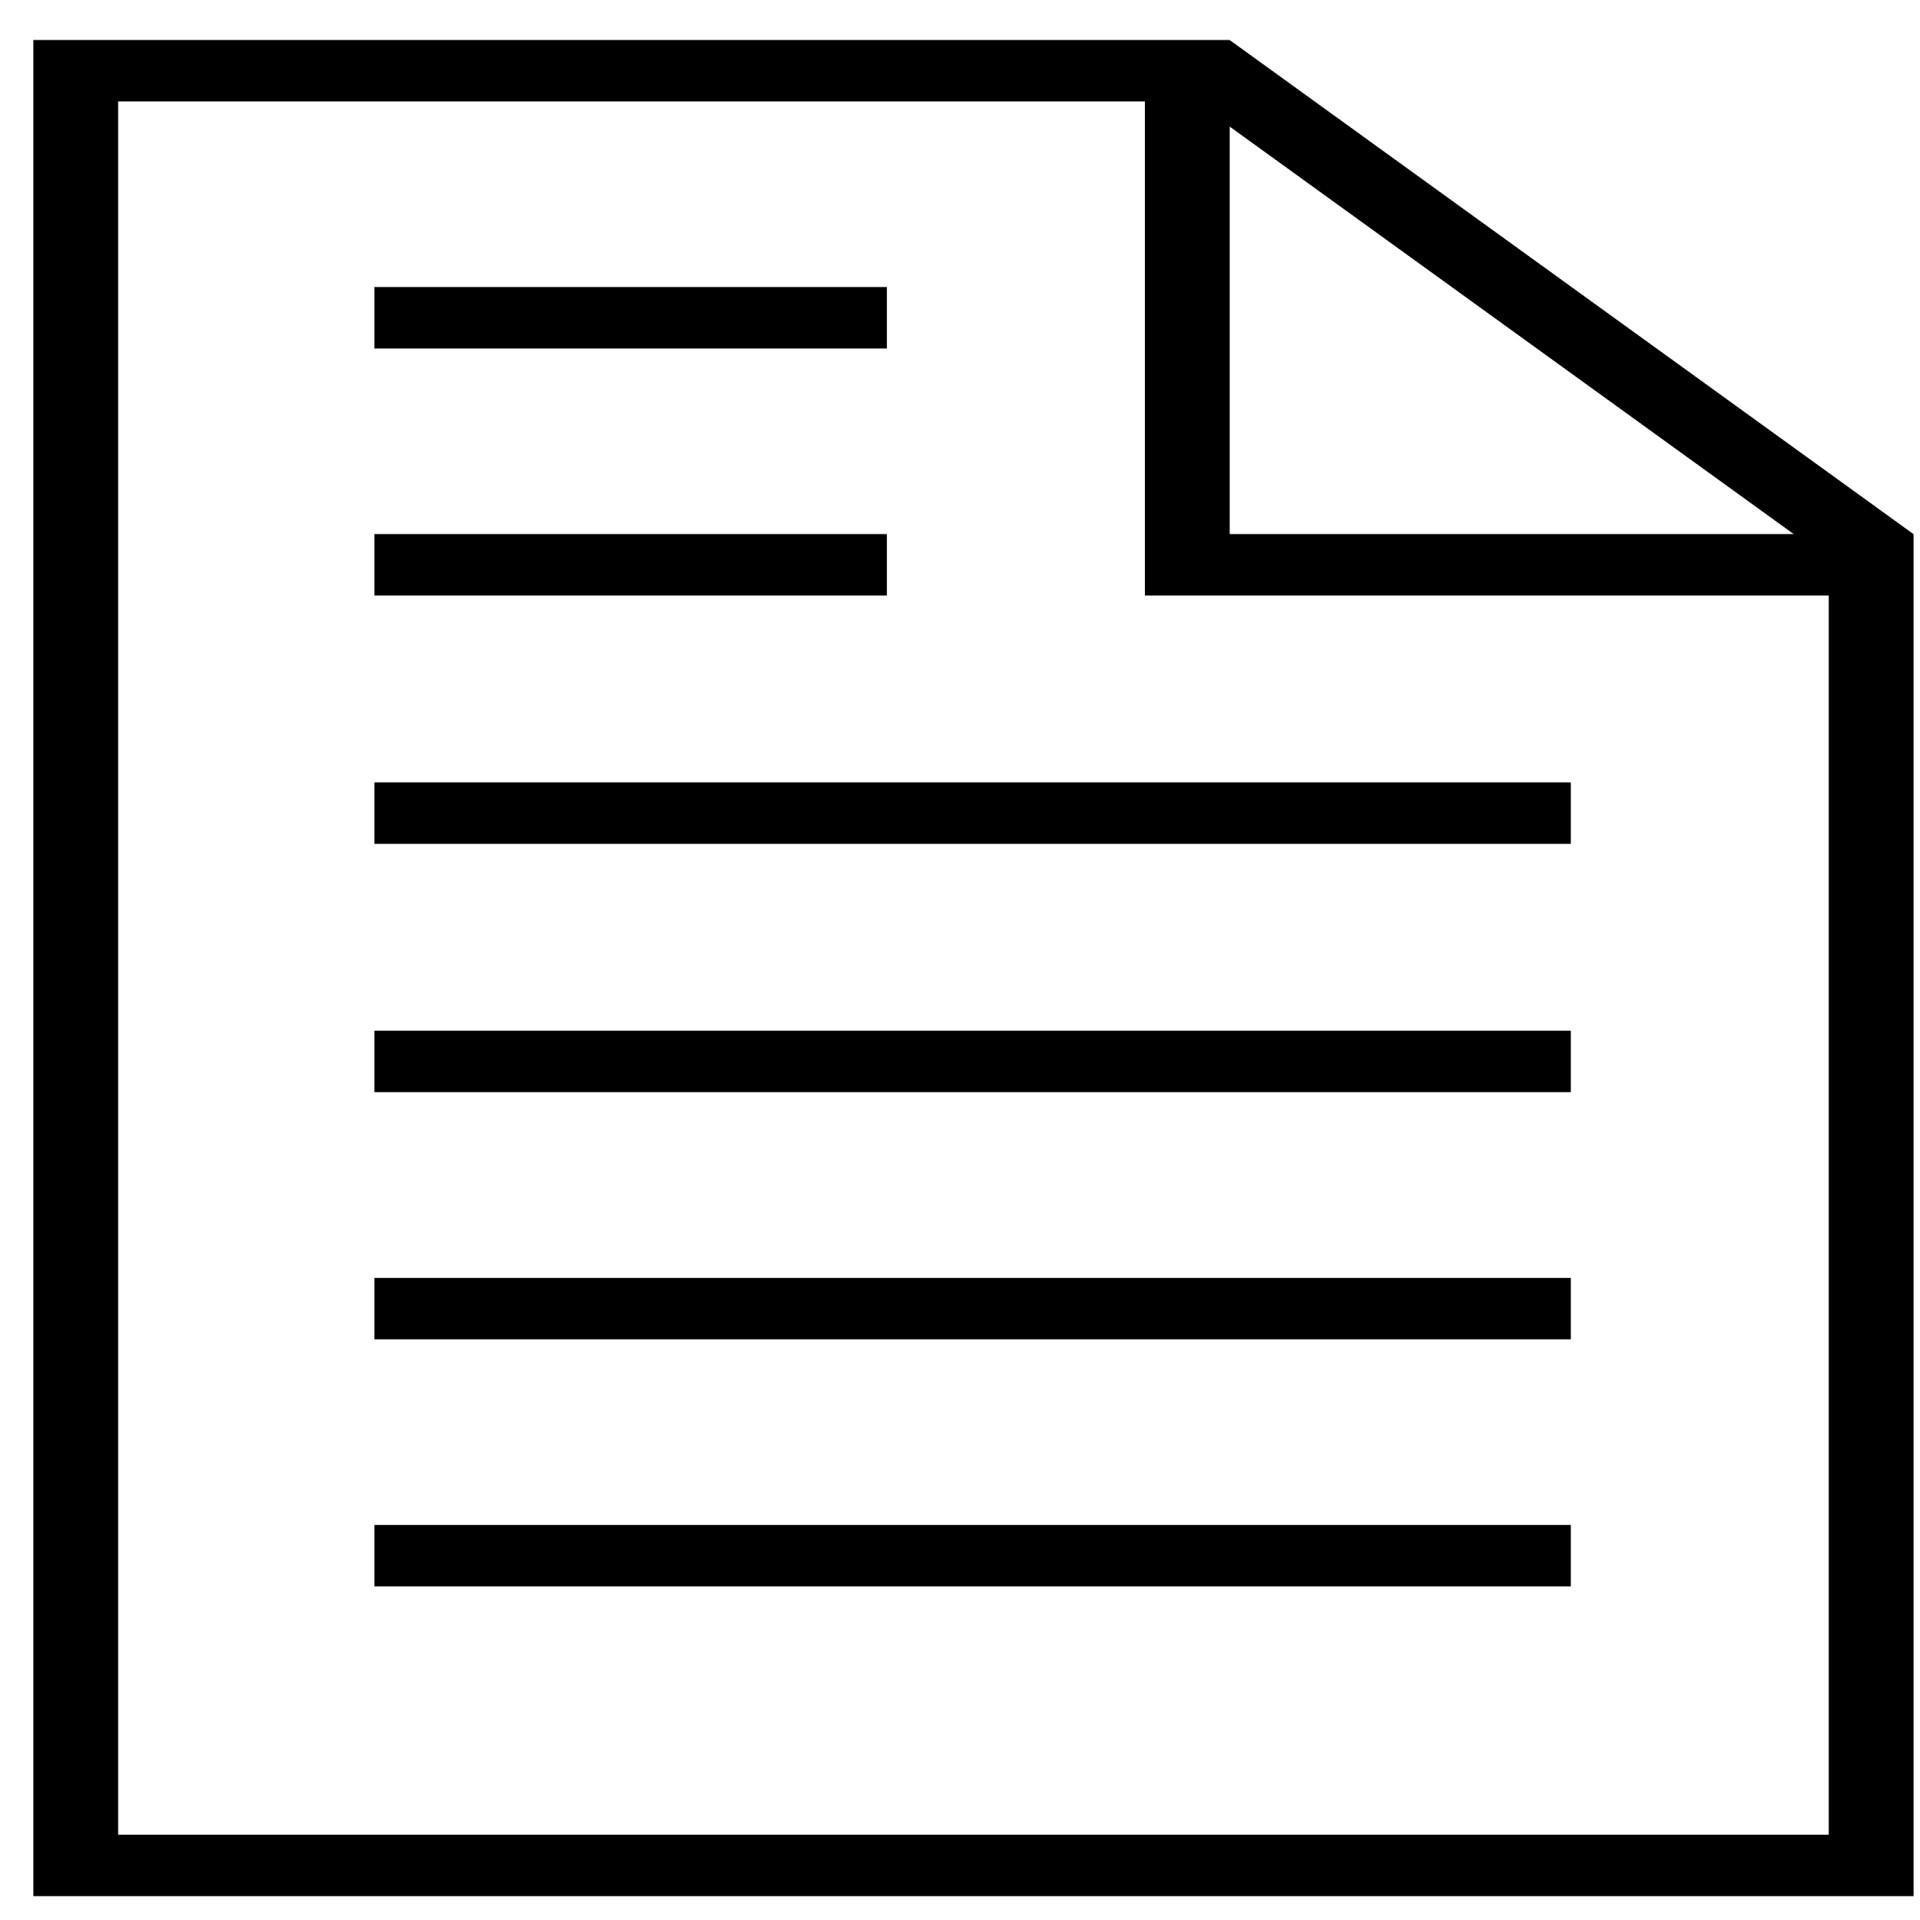 letterhead-silhouette